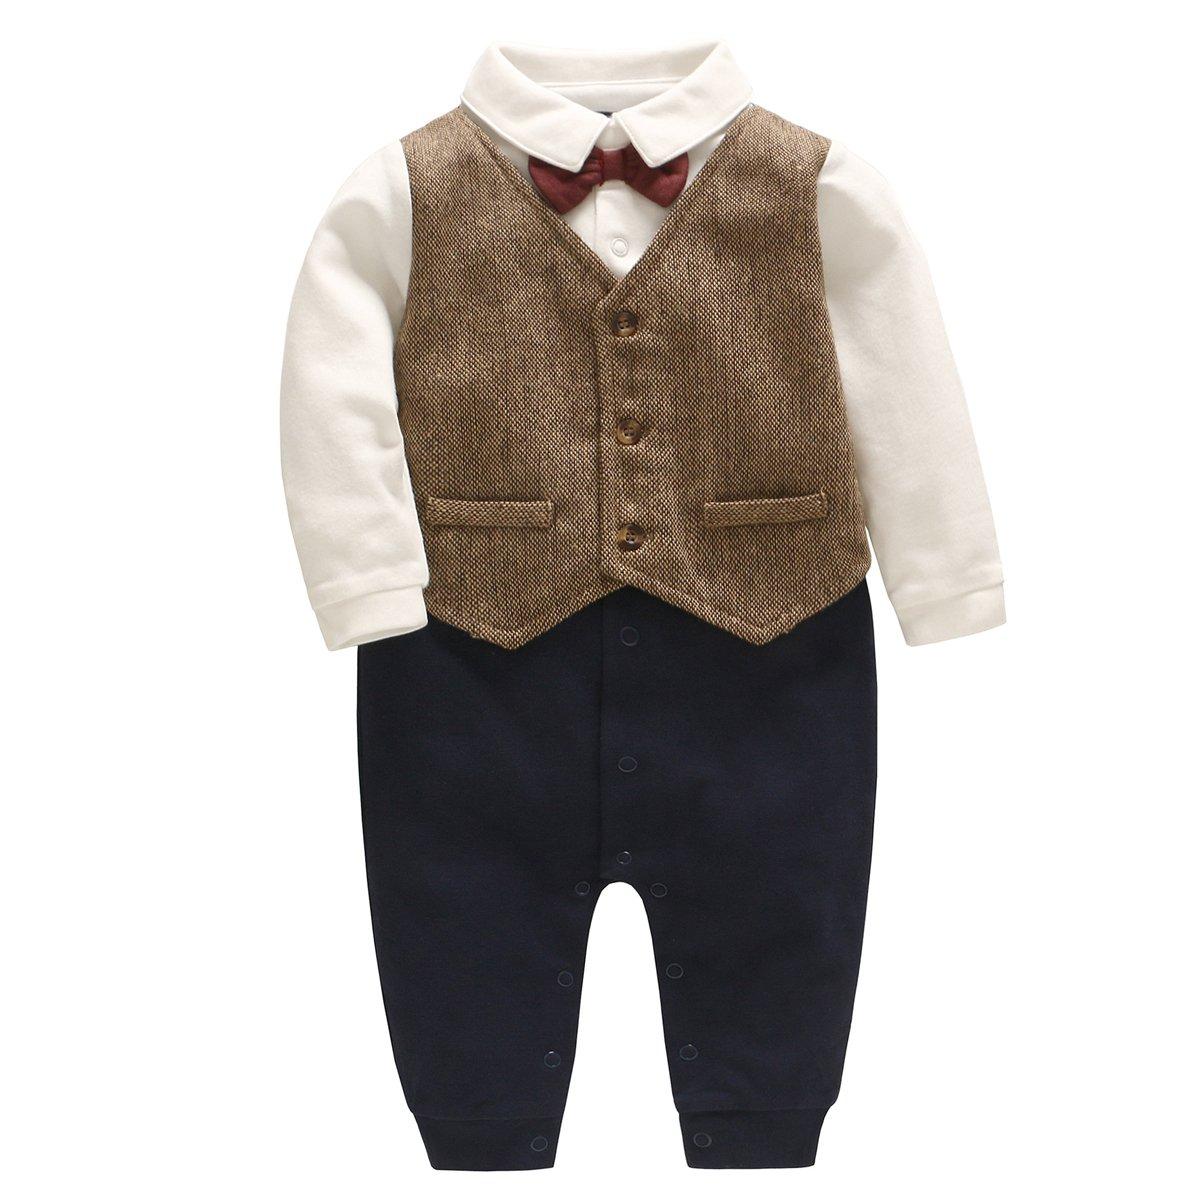 Bebone Baby Boys Outfits Clothes Wedding Gentleman Romper Jumpsuit Bodysuit